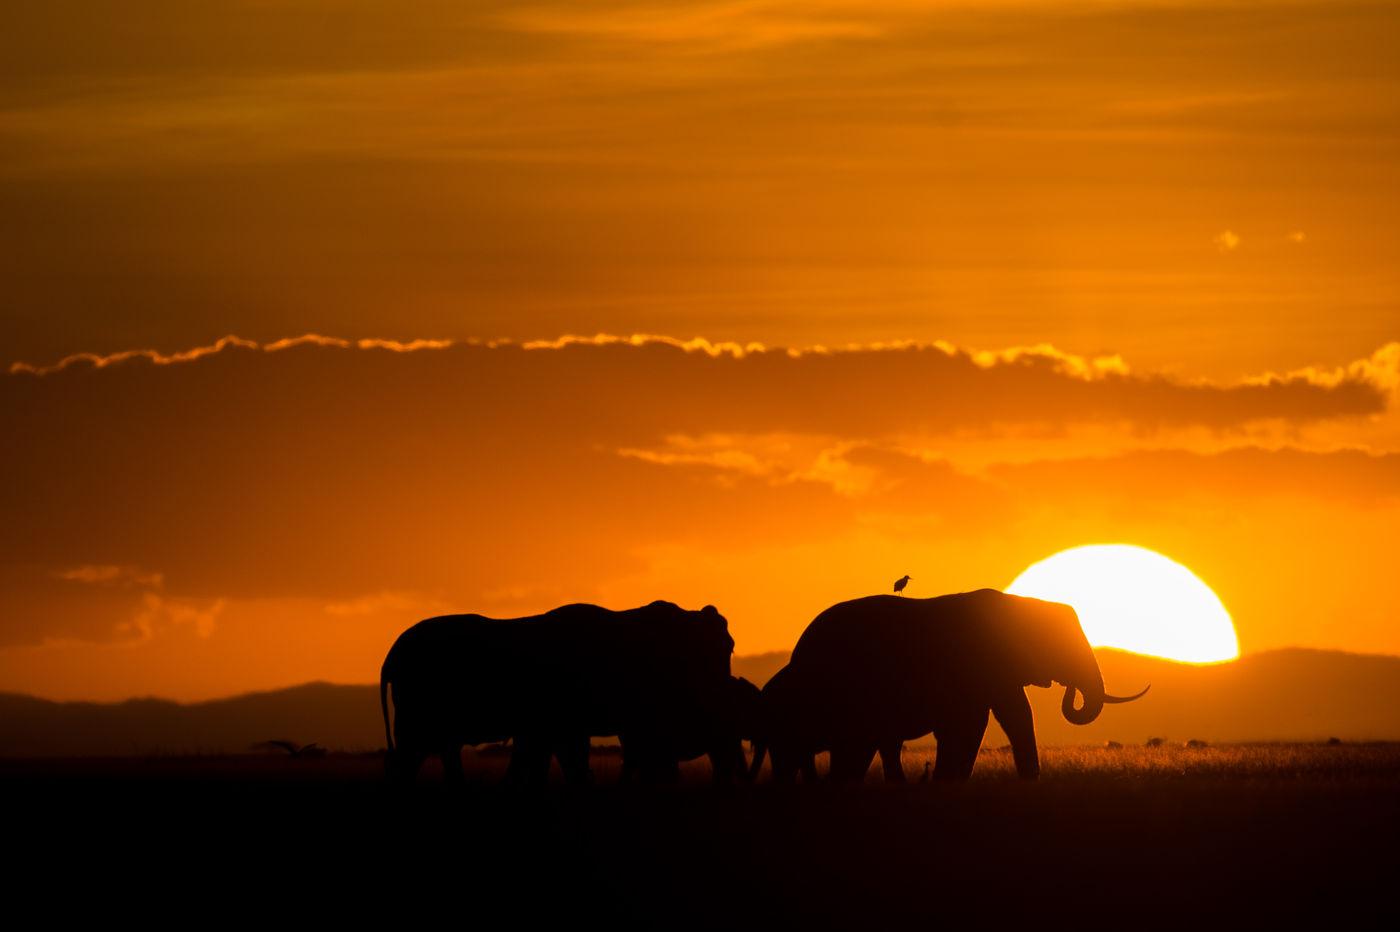 Olifanten bij zonsondergang. © Billy Herman